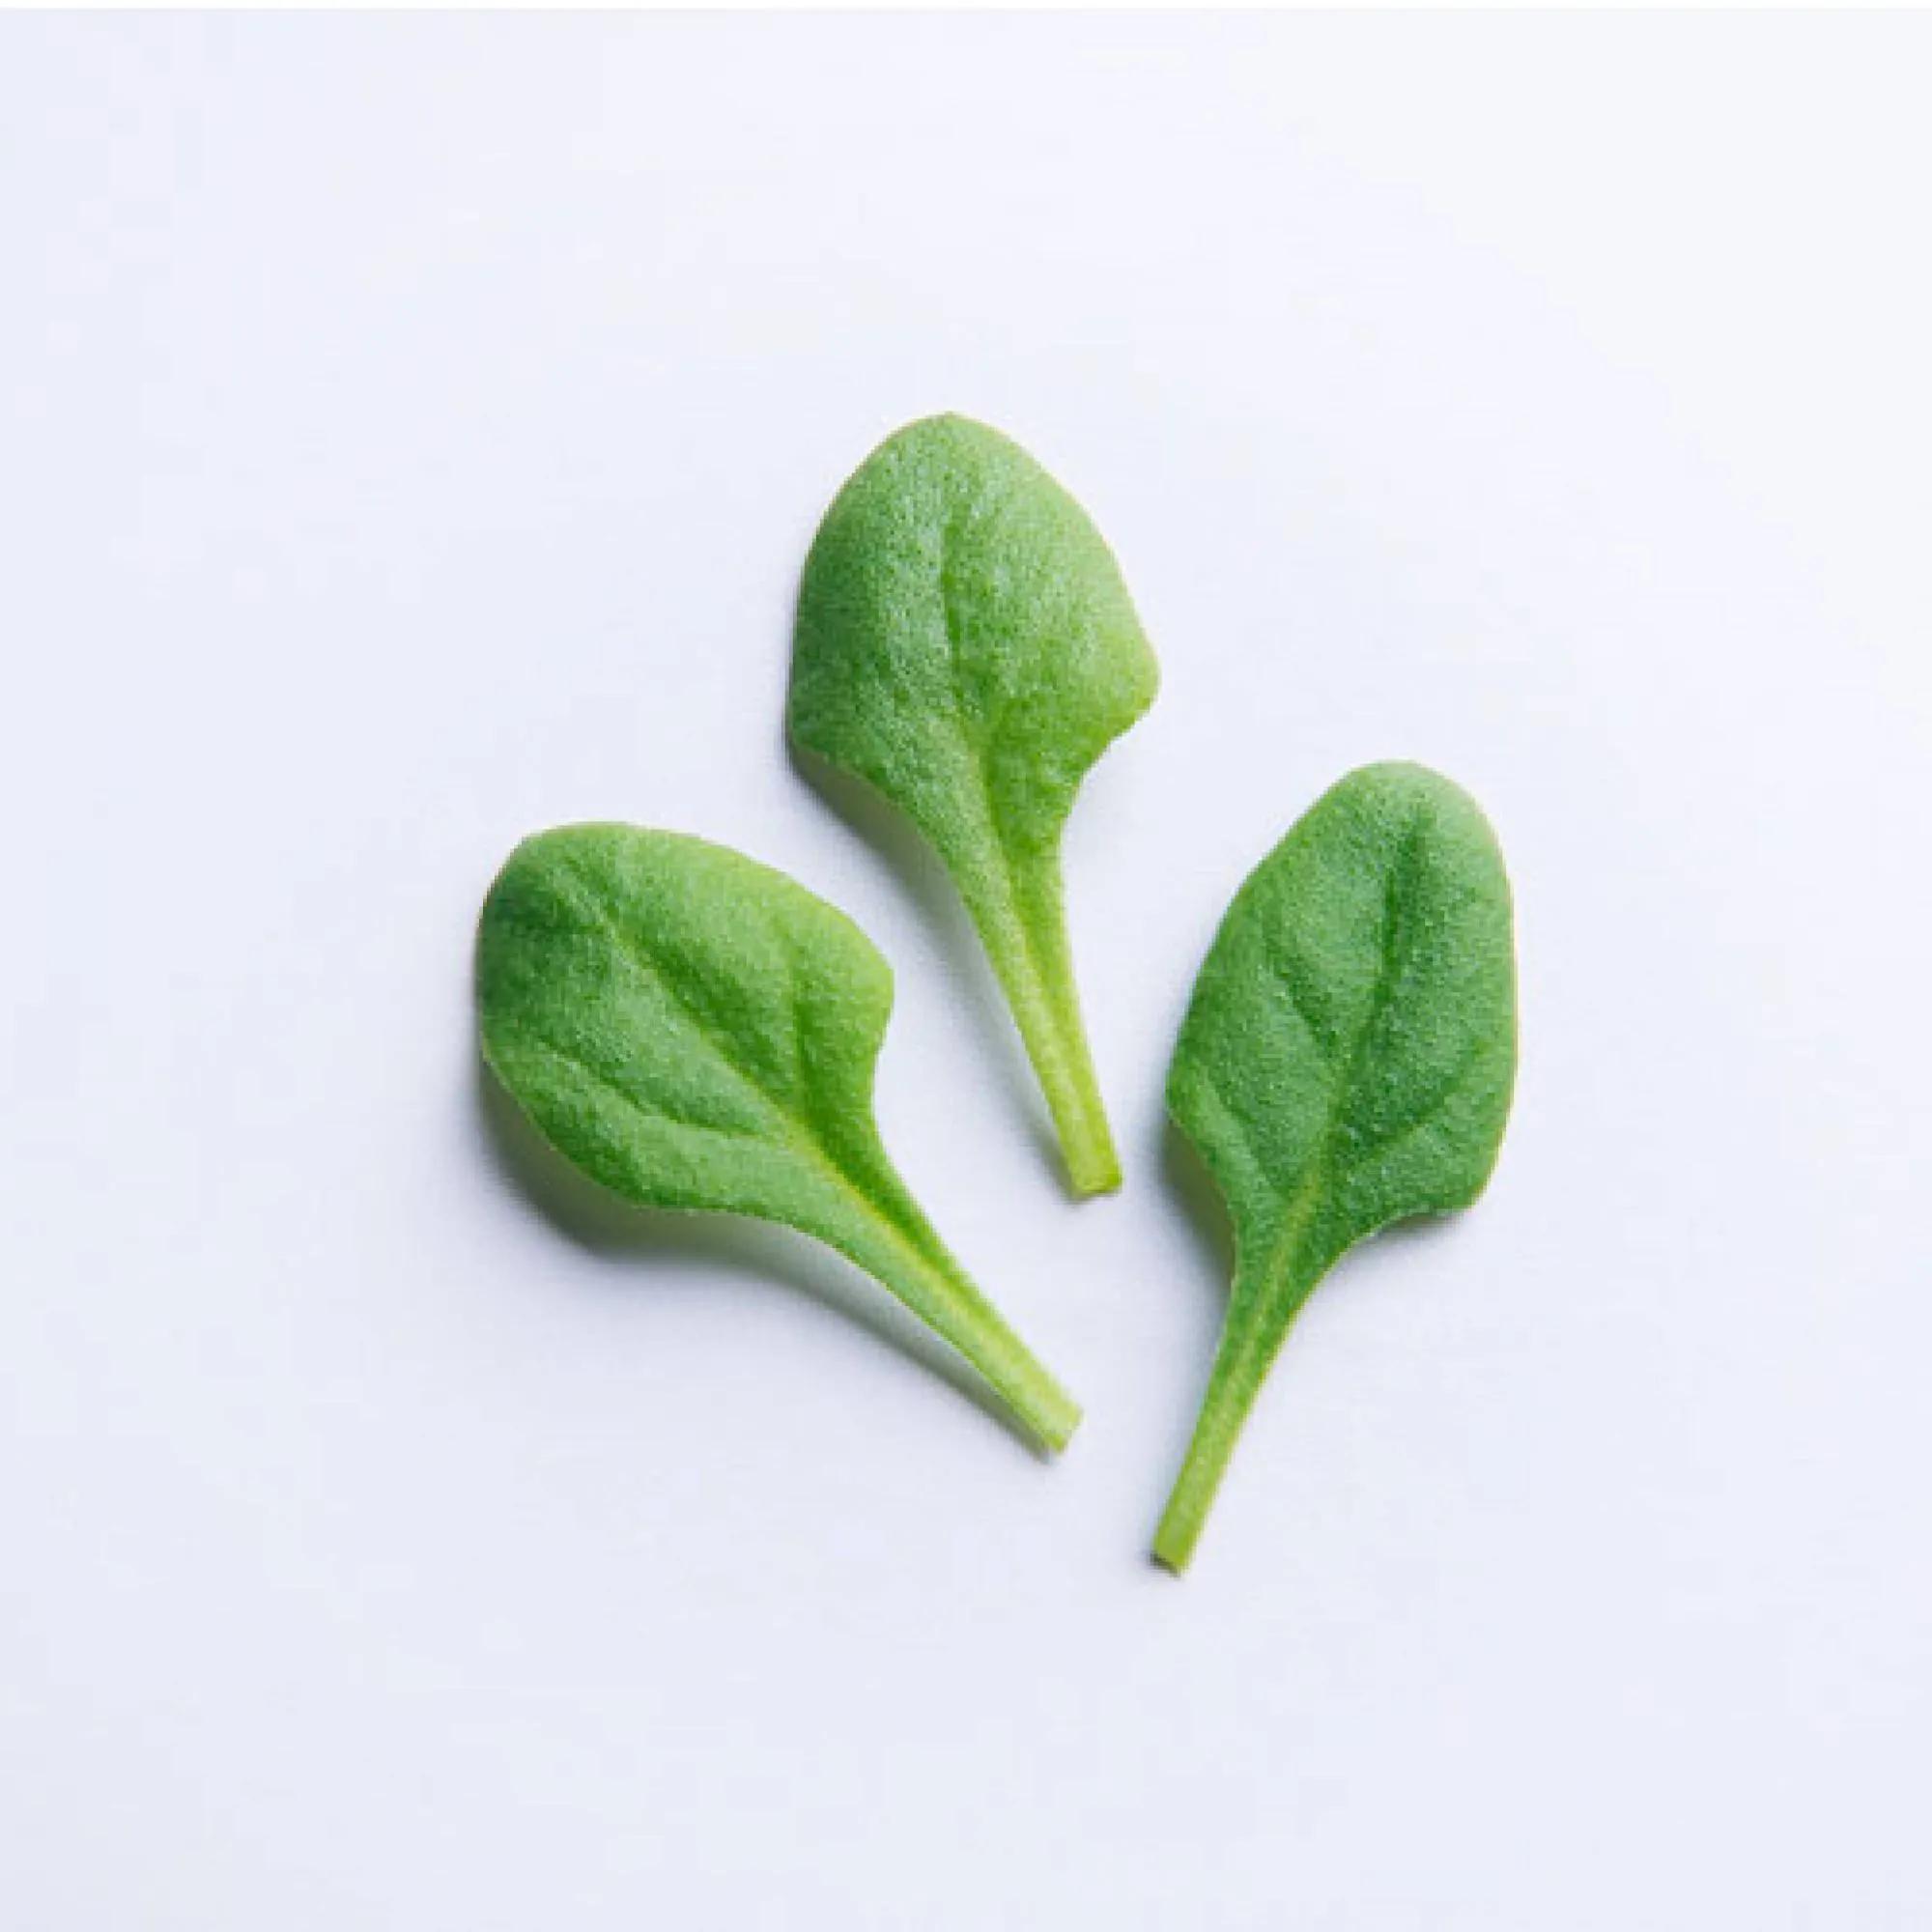 Sementes para plantar Espinafre Baby Leaf em vasos autoirrigáveis RAIZ  - Vasos Raiz Loja Oficial